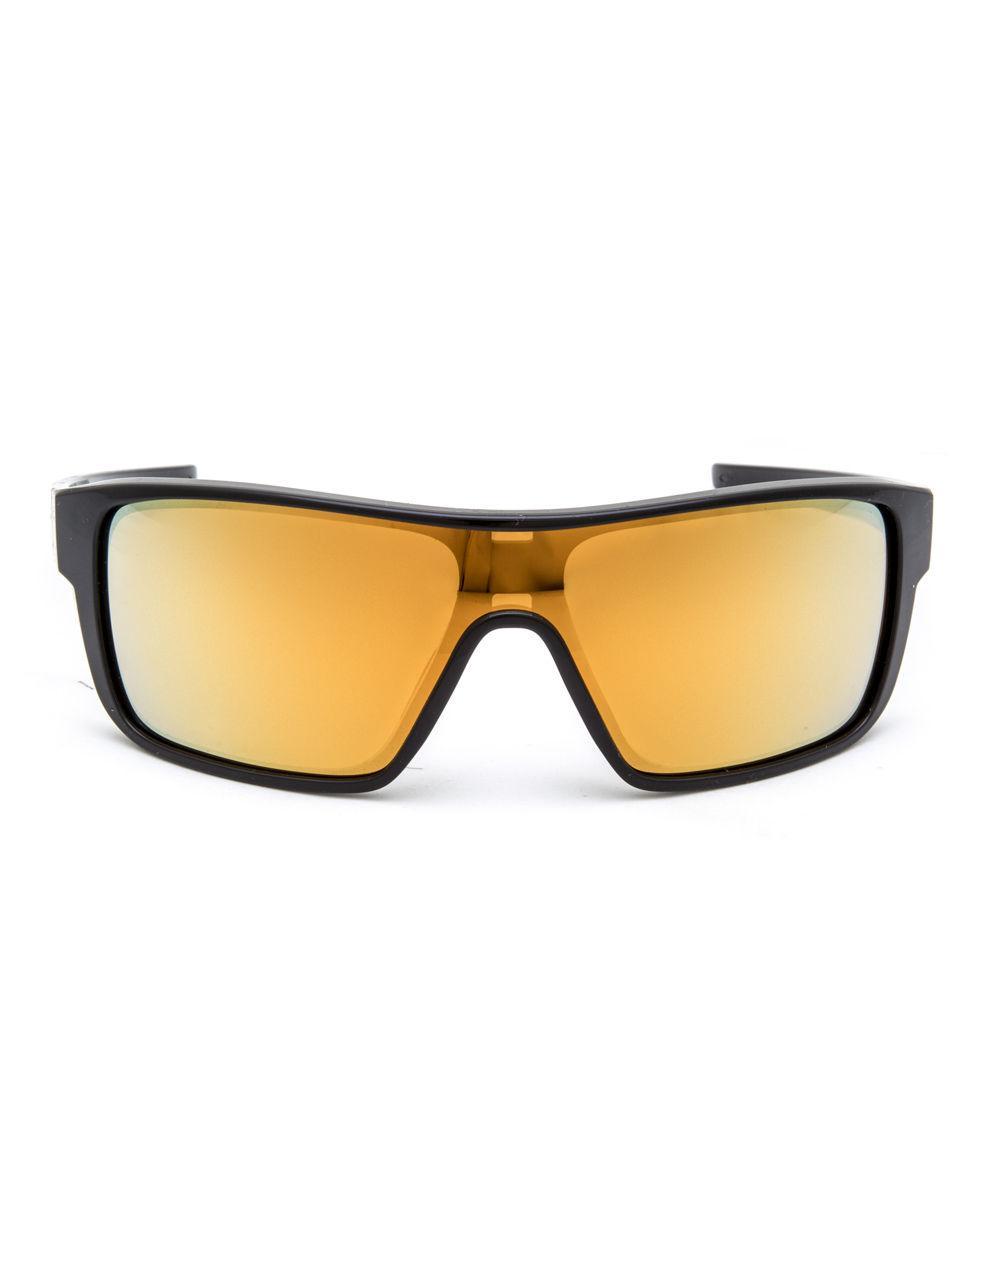 Lyst - Oakley Straightback Polished Black   24k Iridium Sunglasses in Black  for Men 2172025980